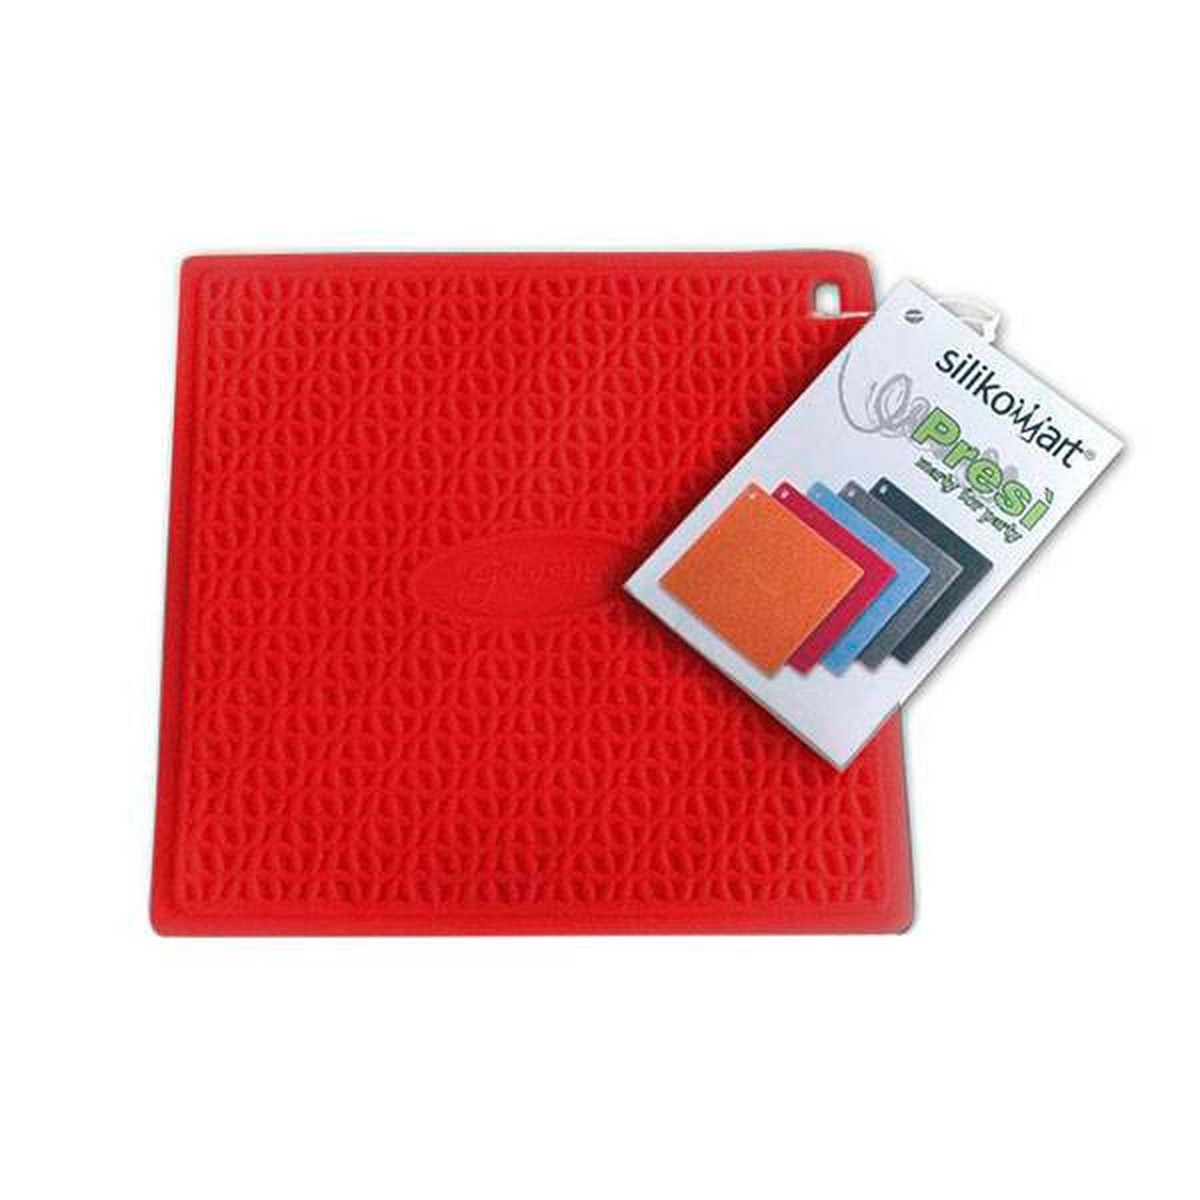 Manique en silicone rouge - Silikomart